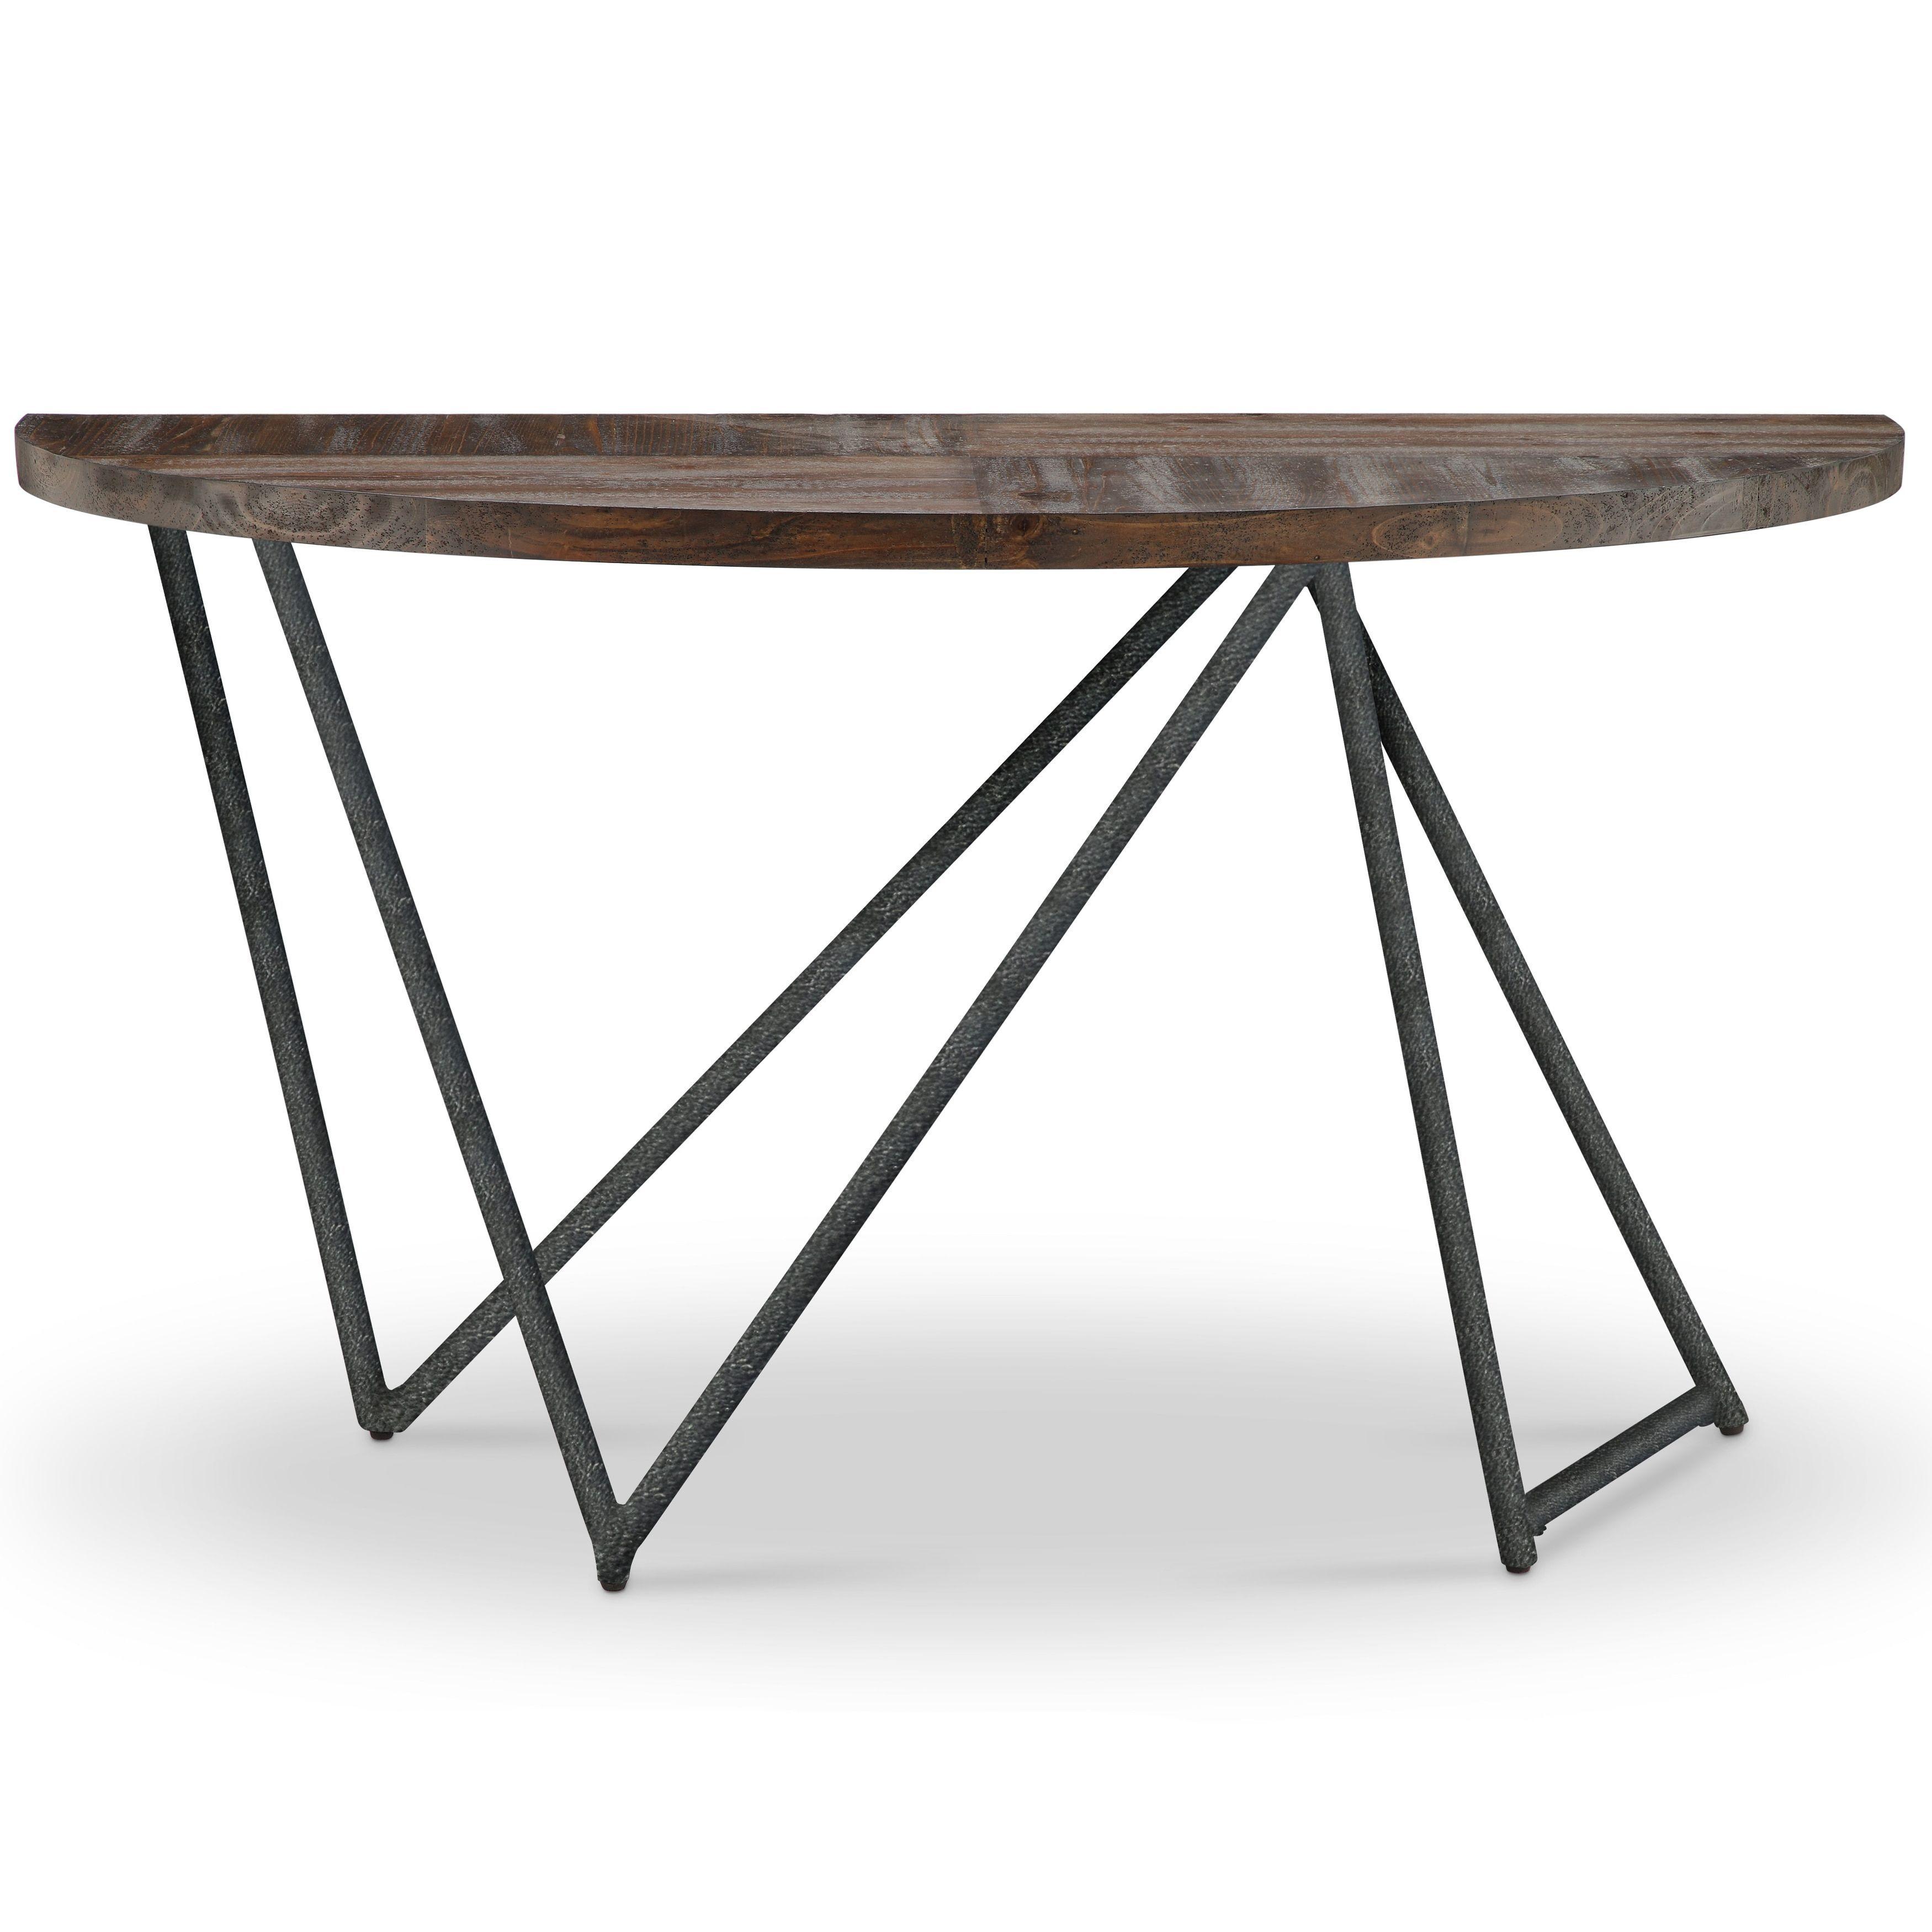 Magnussen home furnishings bixler transitional distressed nutmeg demilune console table demilune sofa table distressed nutmeg brown